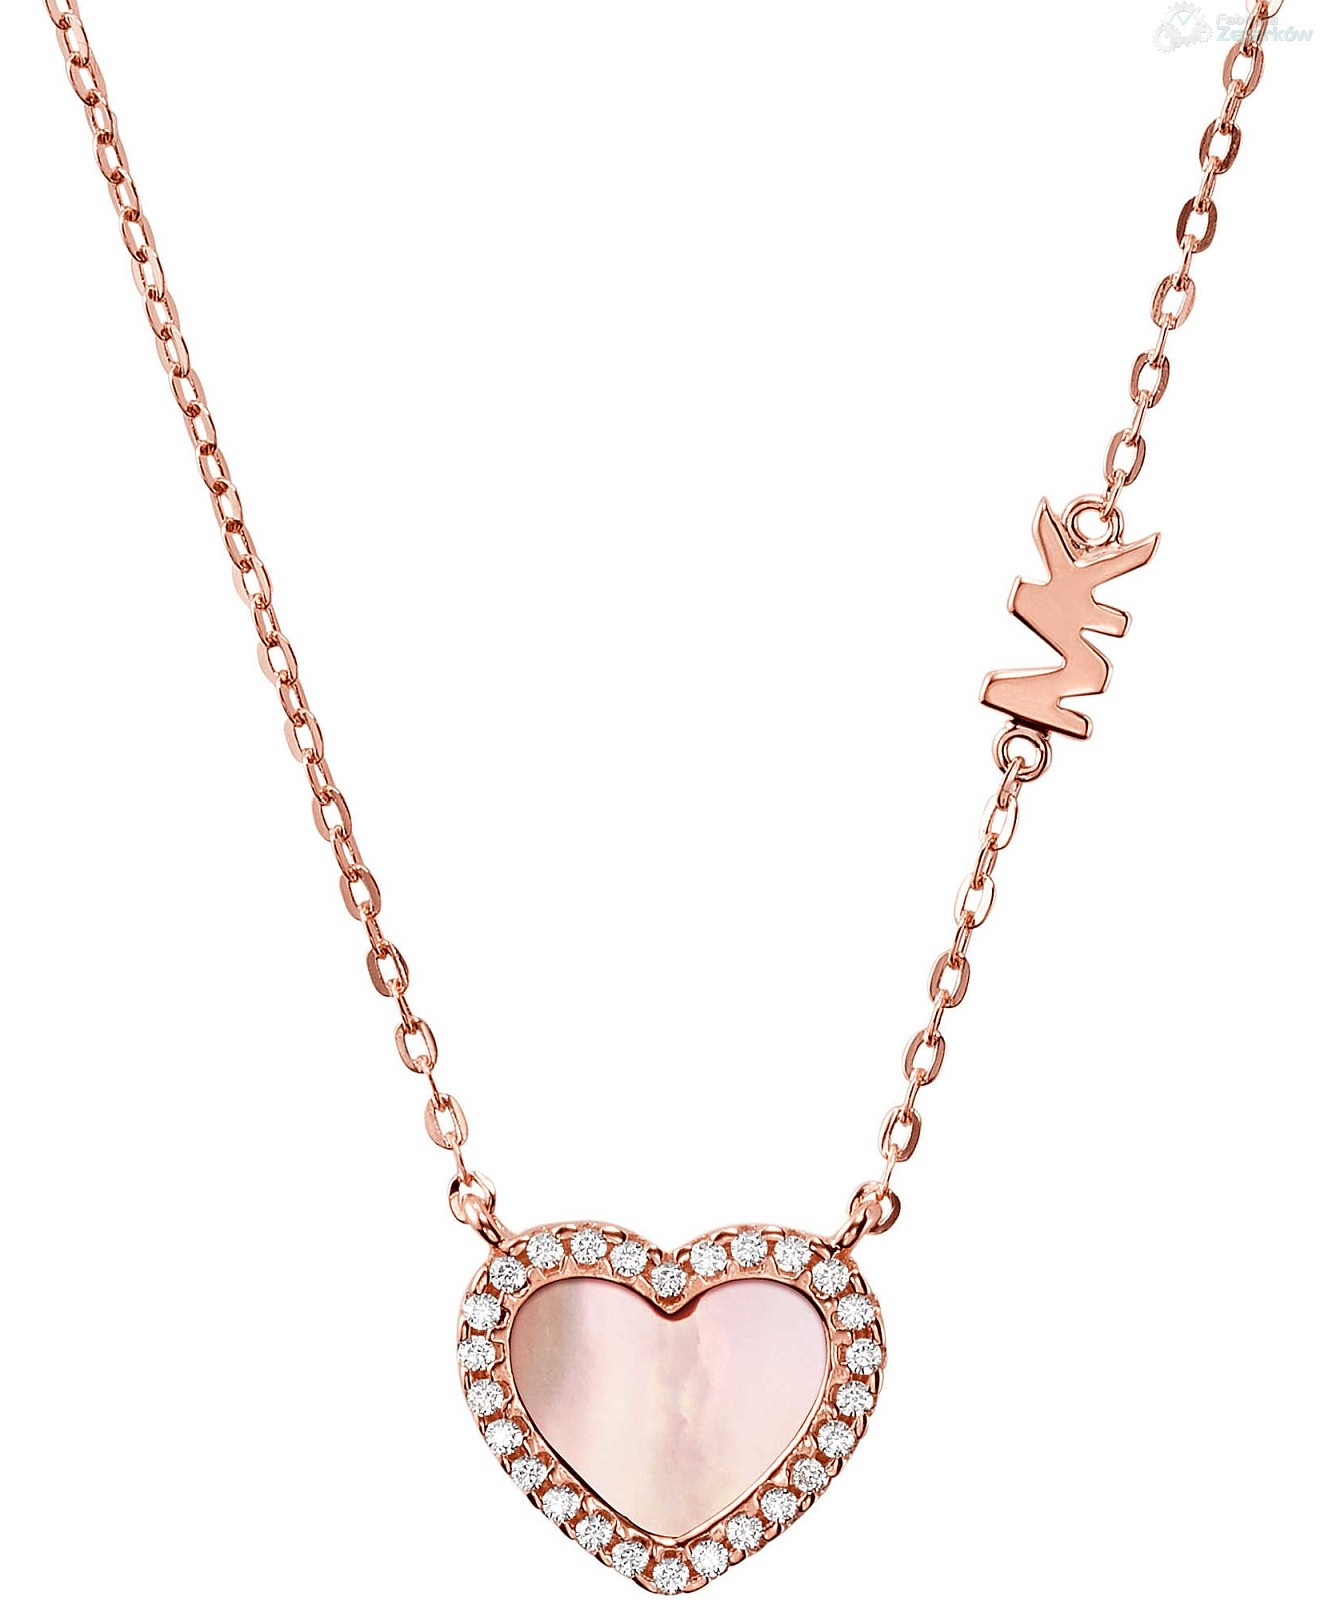 Michael Kors MKC1337A6791 - biżuteria